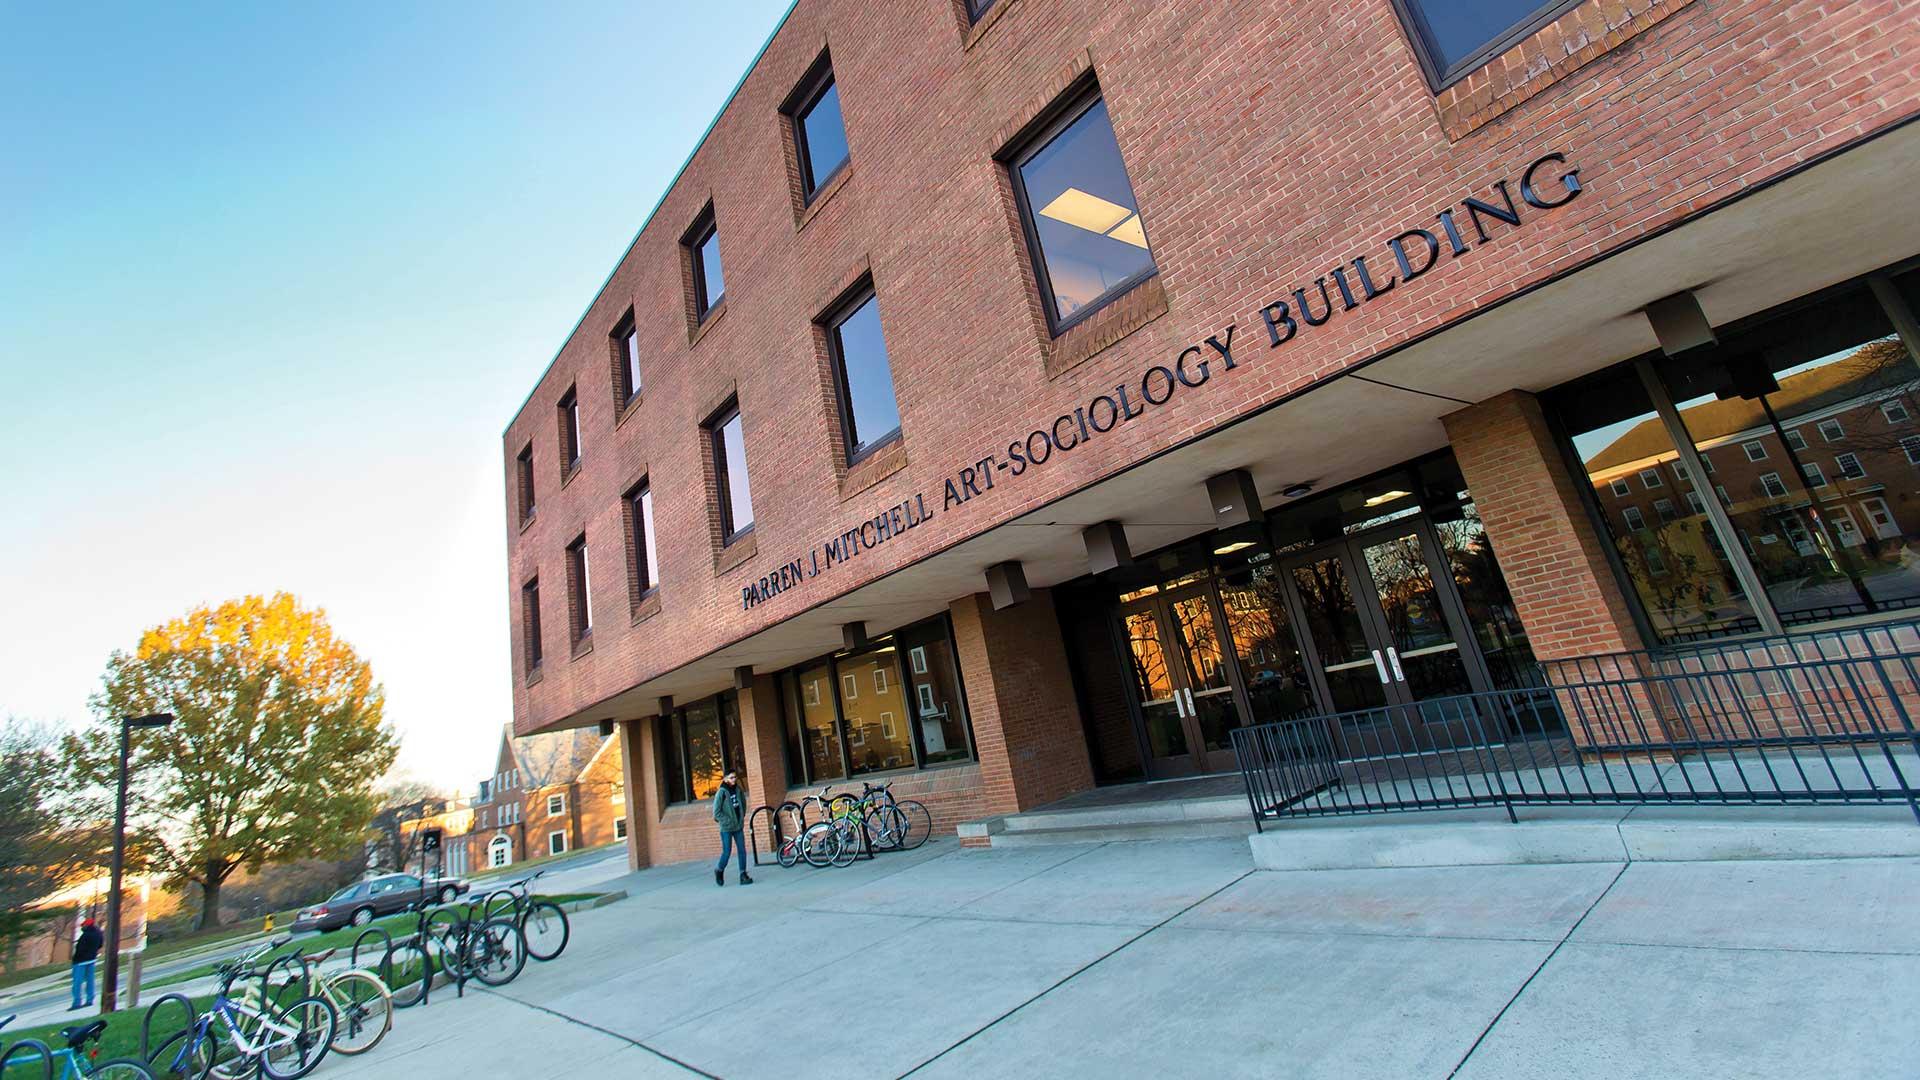 Parren J. Mitchell Sociology Building